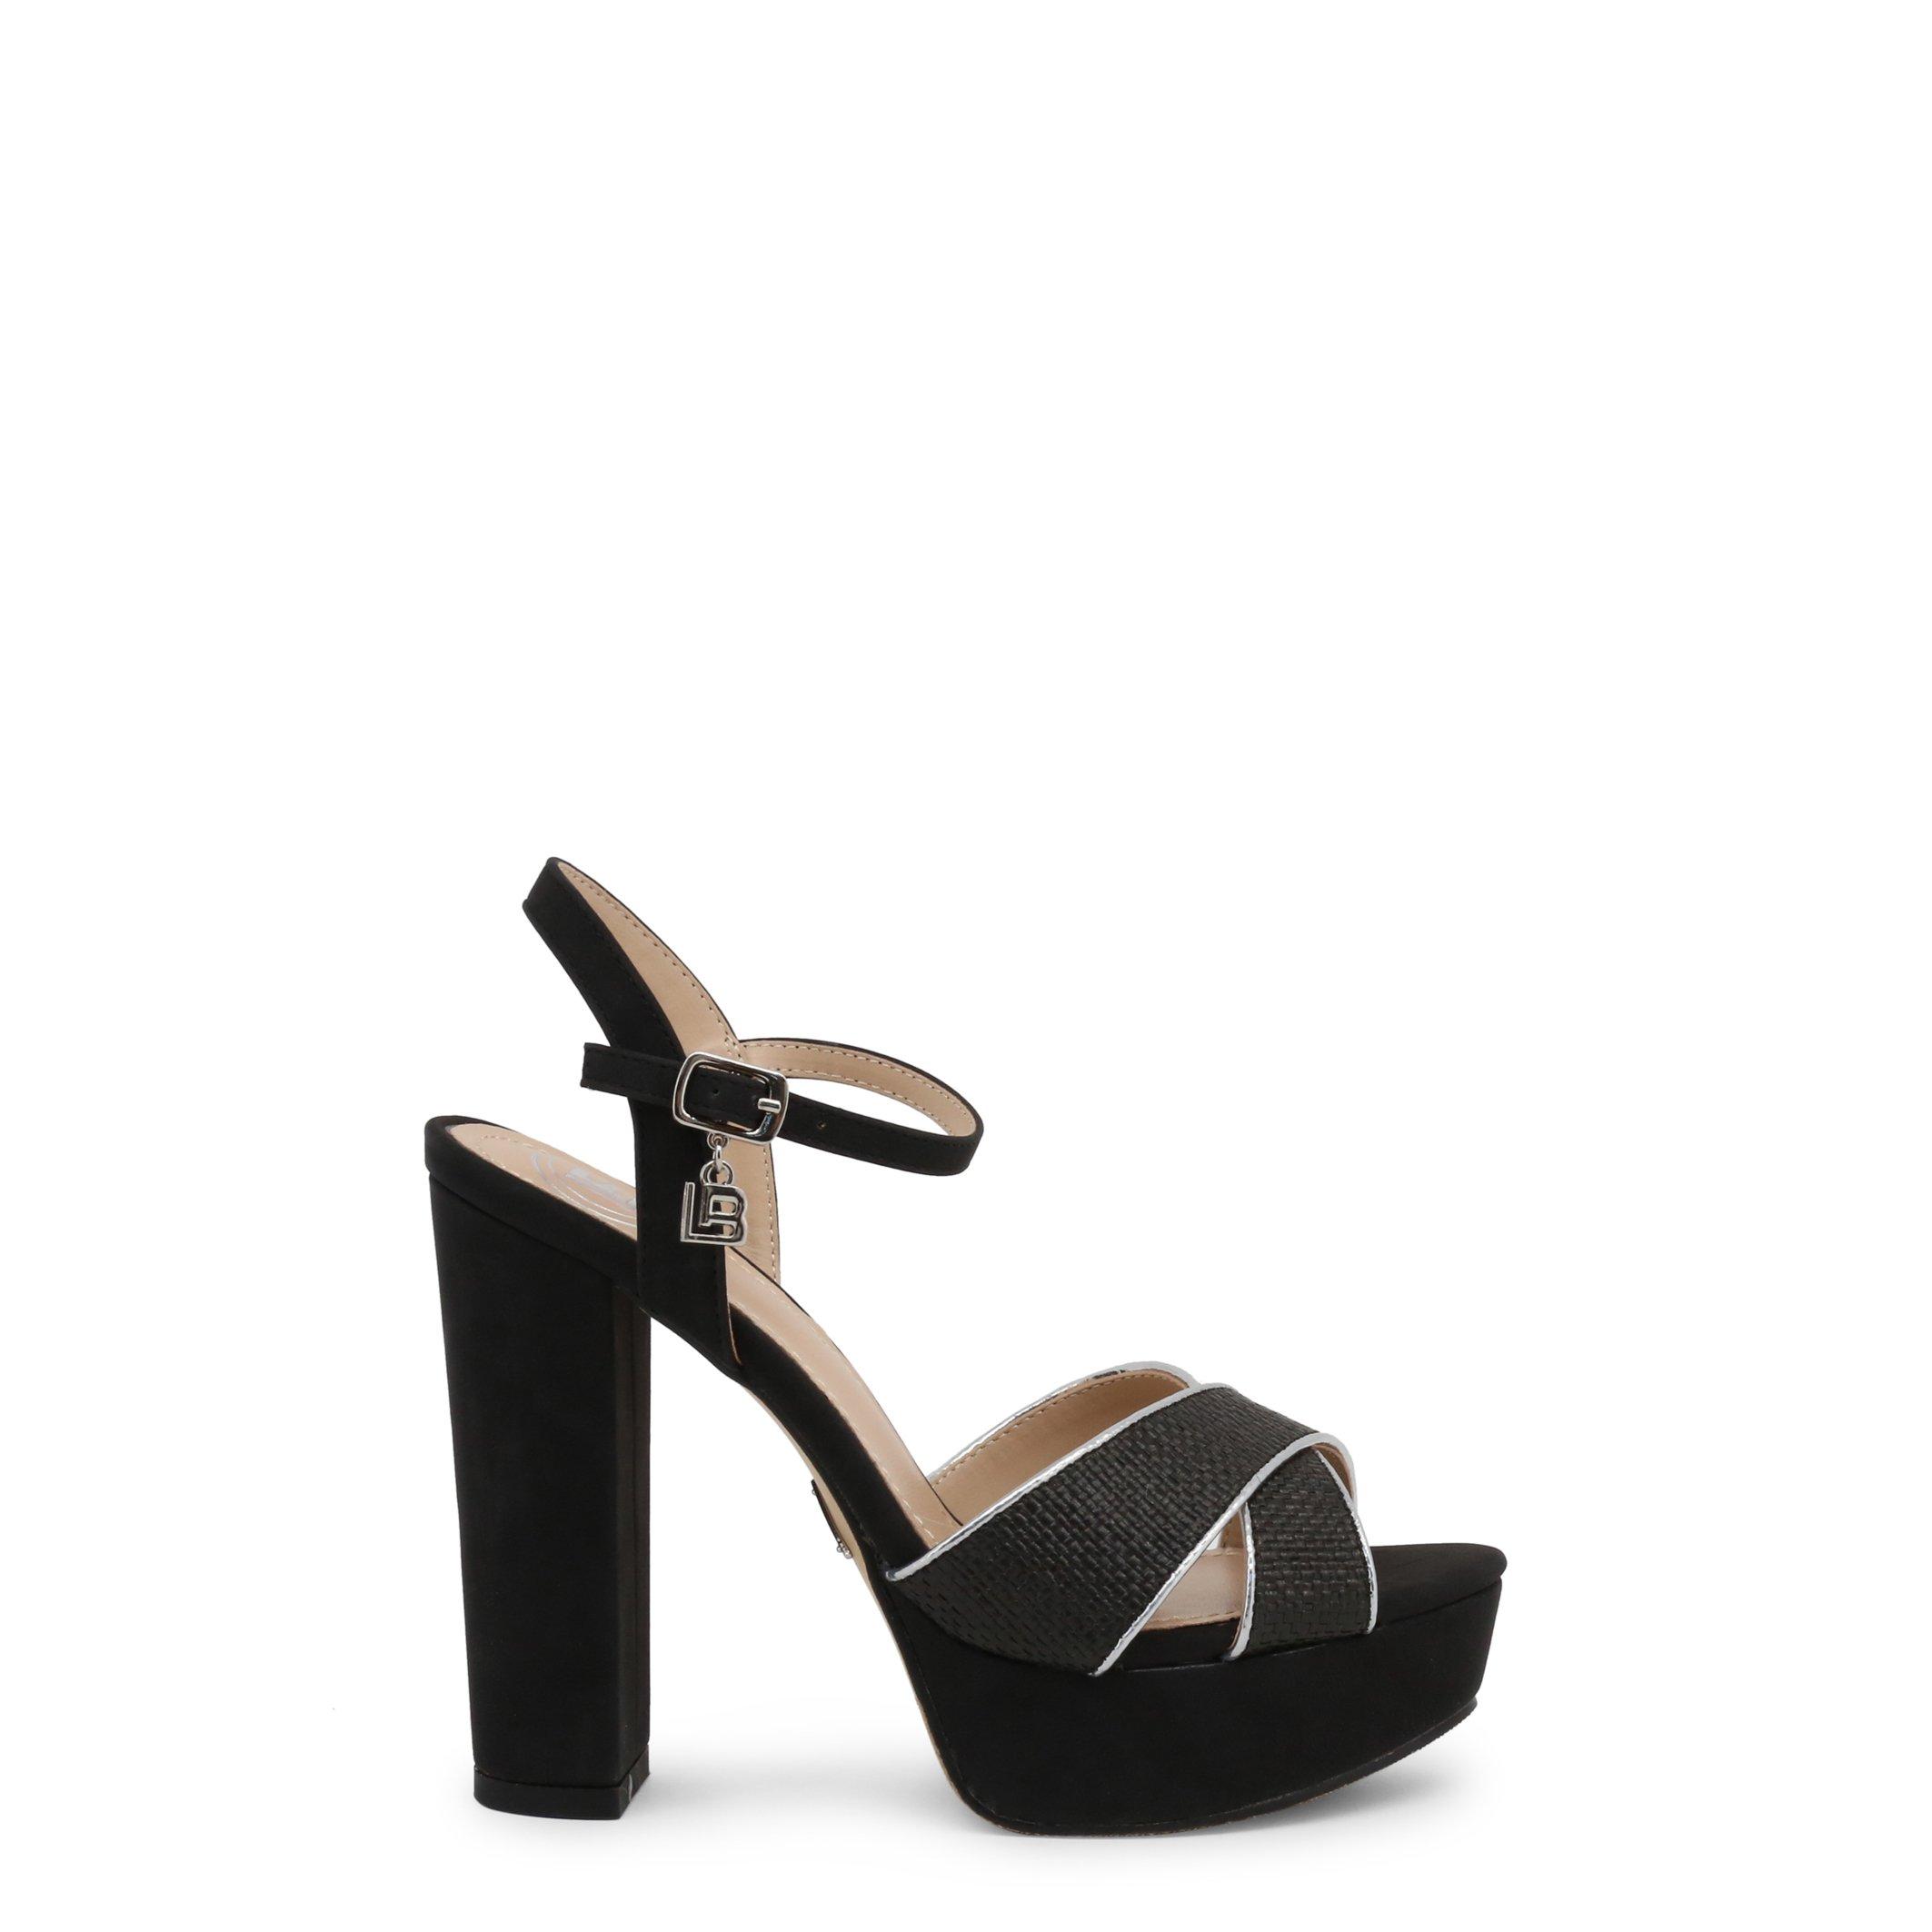 Laura Biagiotti Women's Sandals Various Colours 6118 - black 36 EU